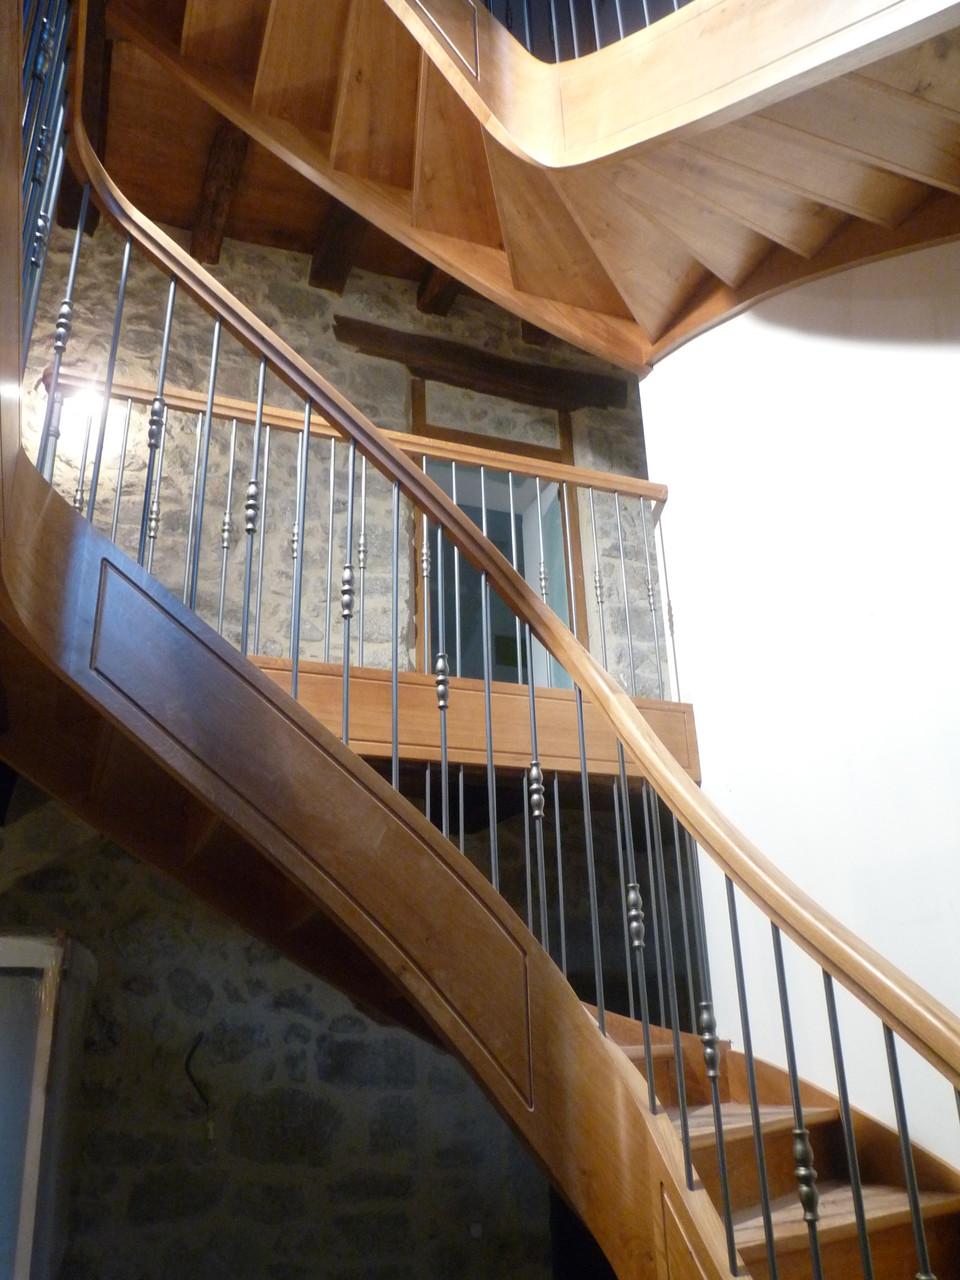 Entreprise MARTY Joël - Aveyron (12) - Escalier débillardé en chêne N°2